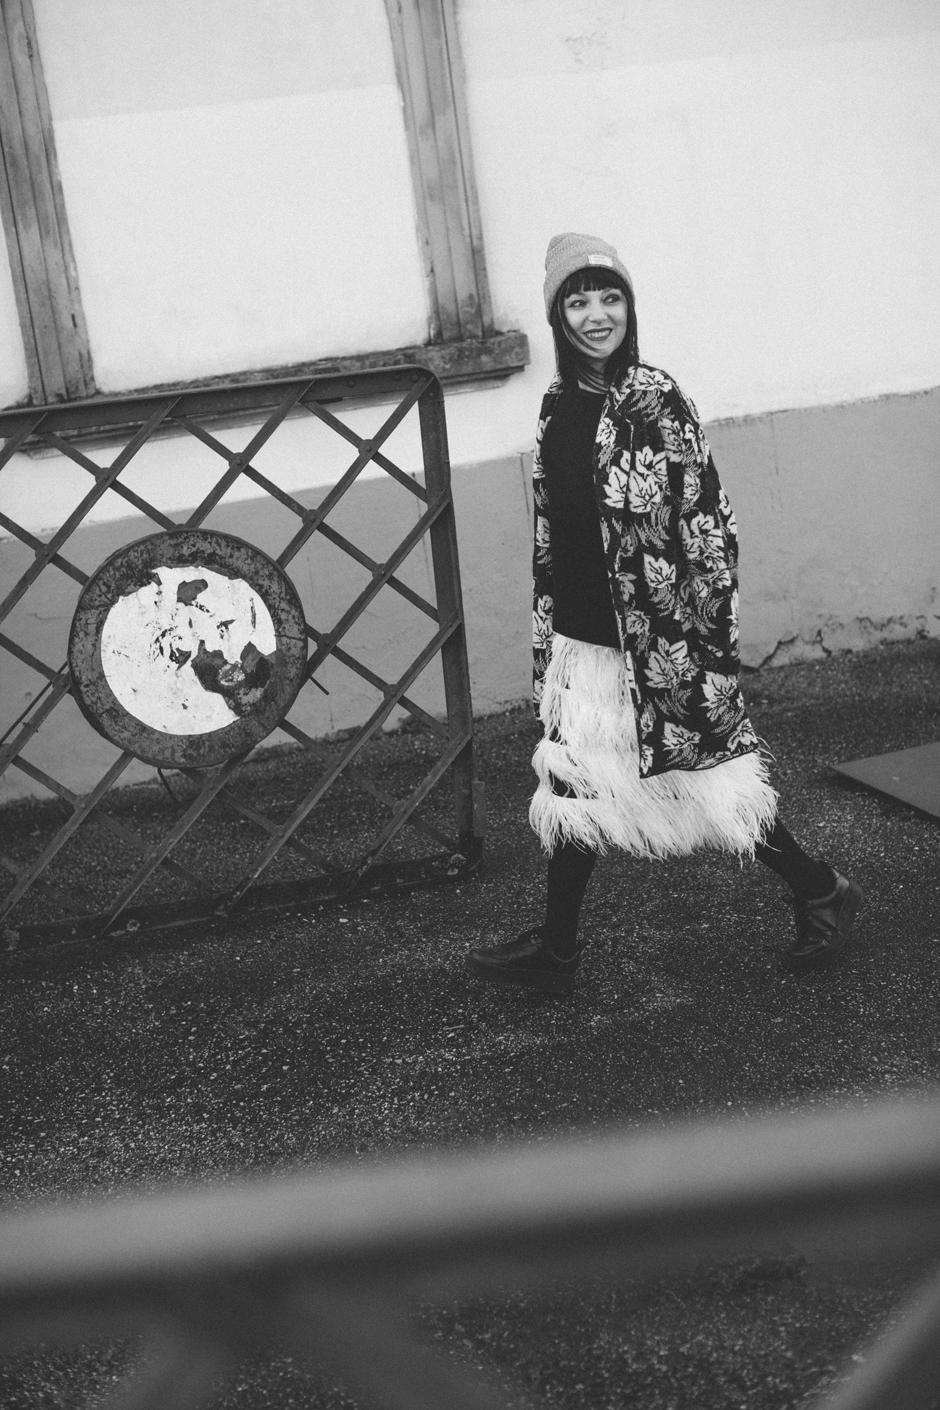 Sandra Bacci, bianco e nero, Mia wish